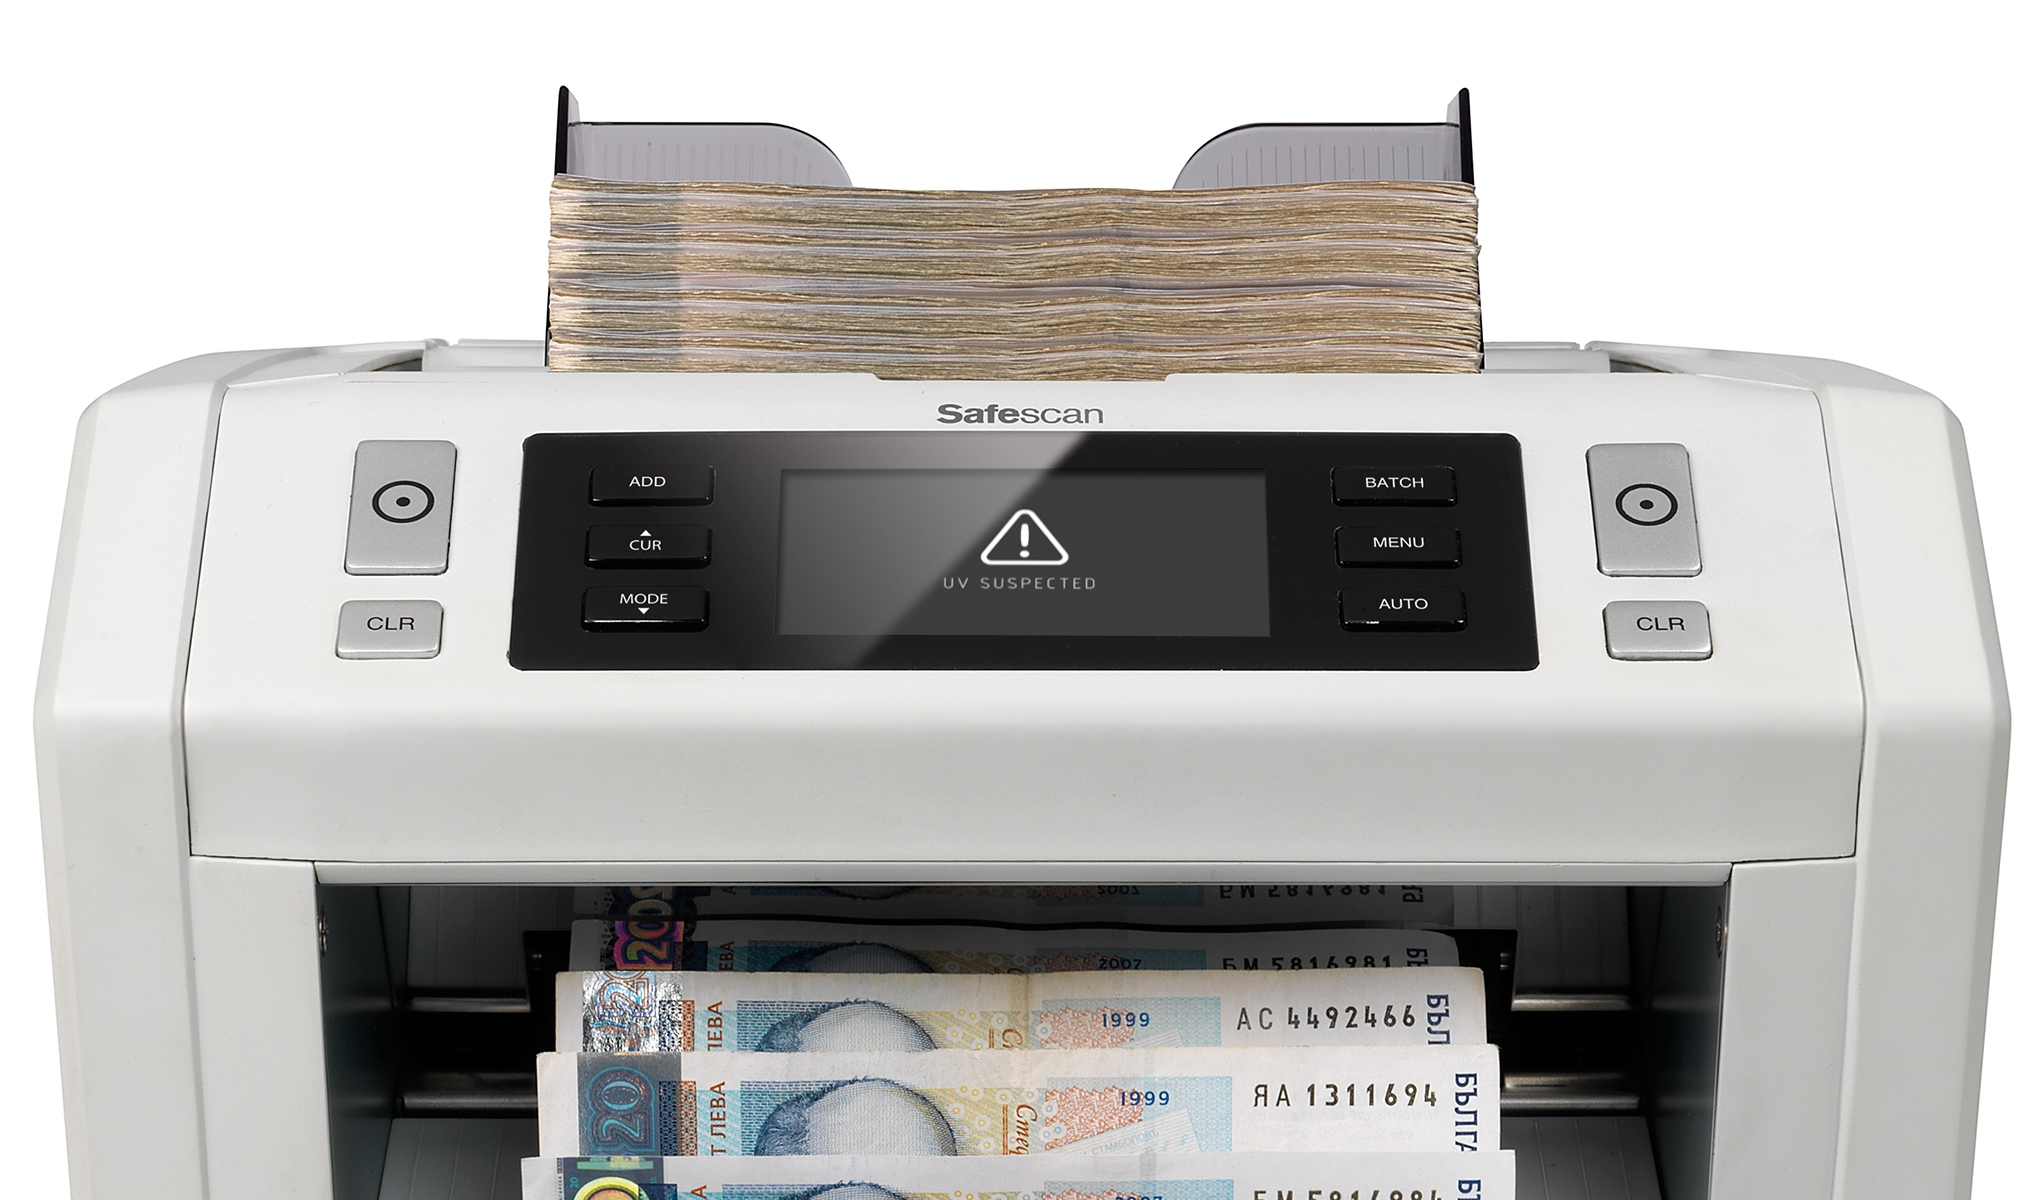 safescan-2660-counterfeit-detection